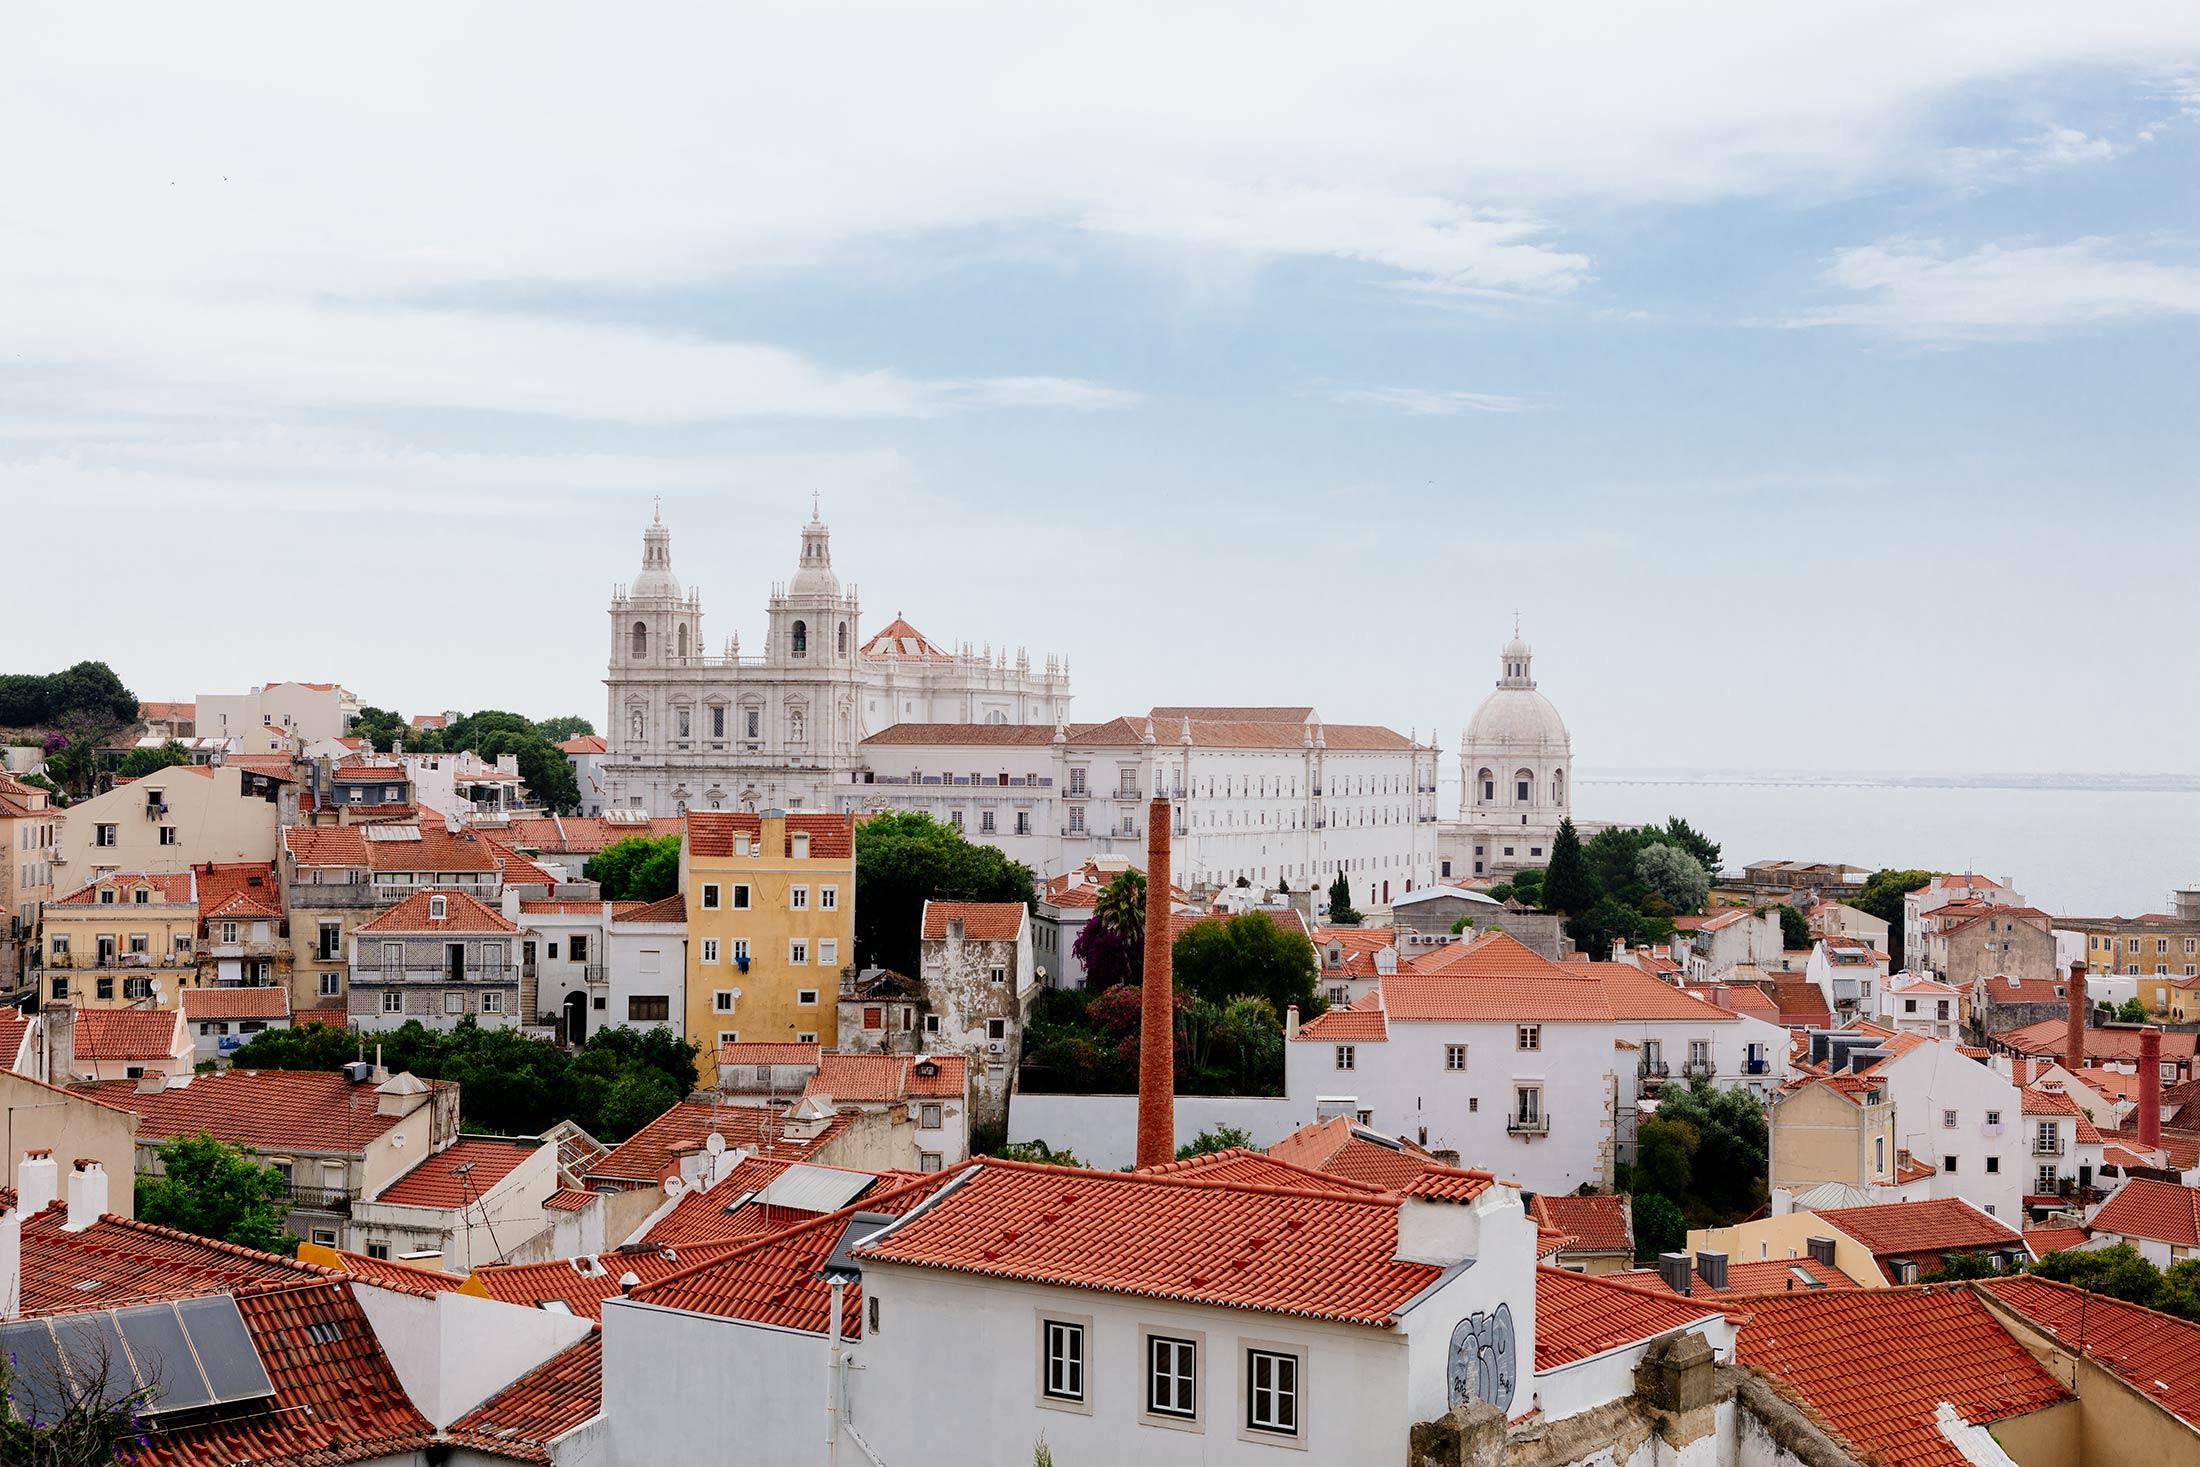 LIS_Lissabon_21-Mitja_Schneehage